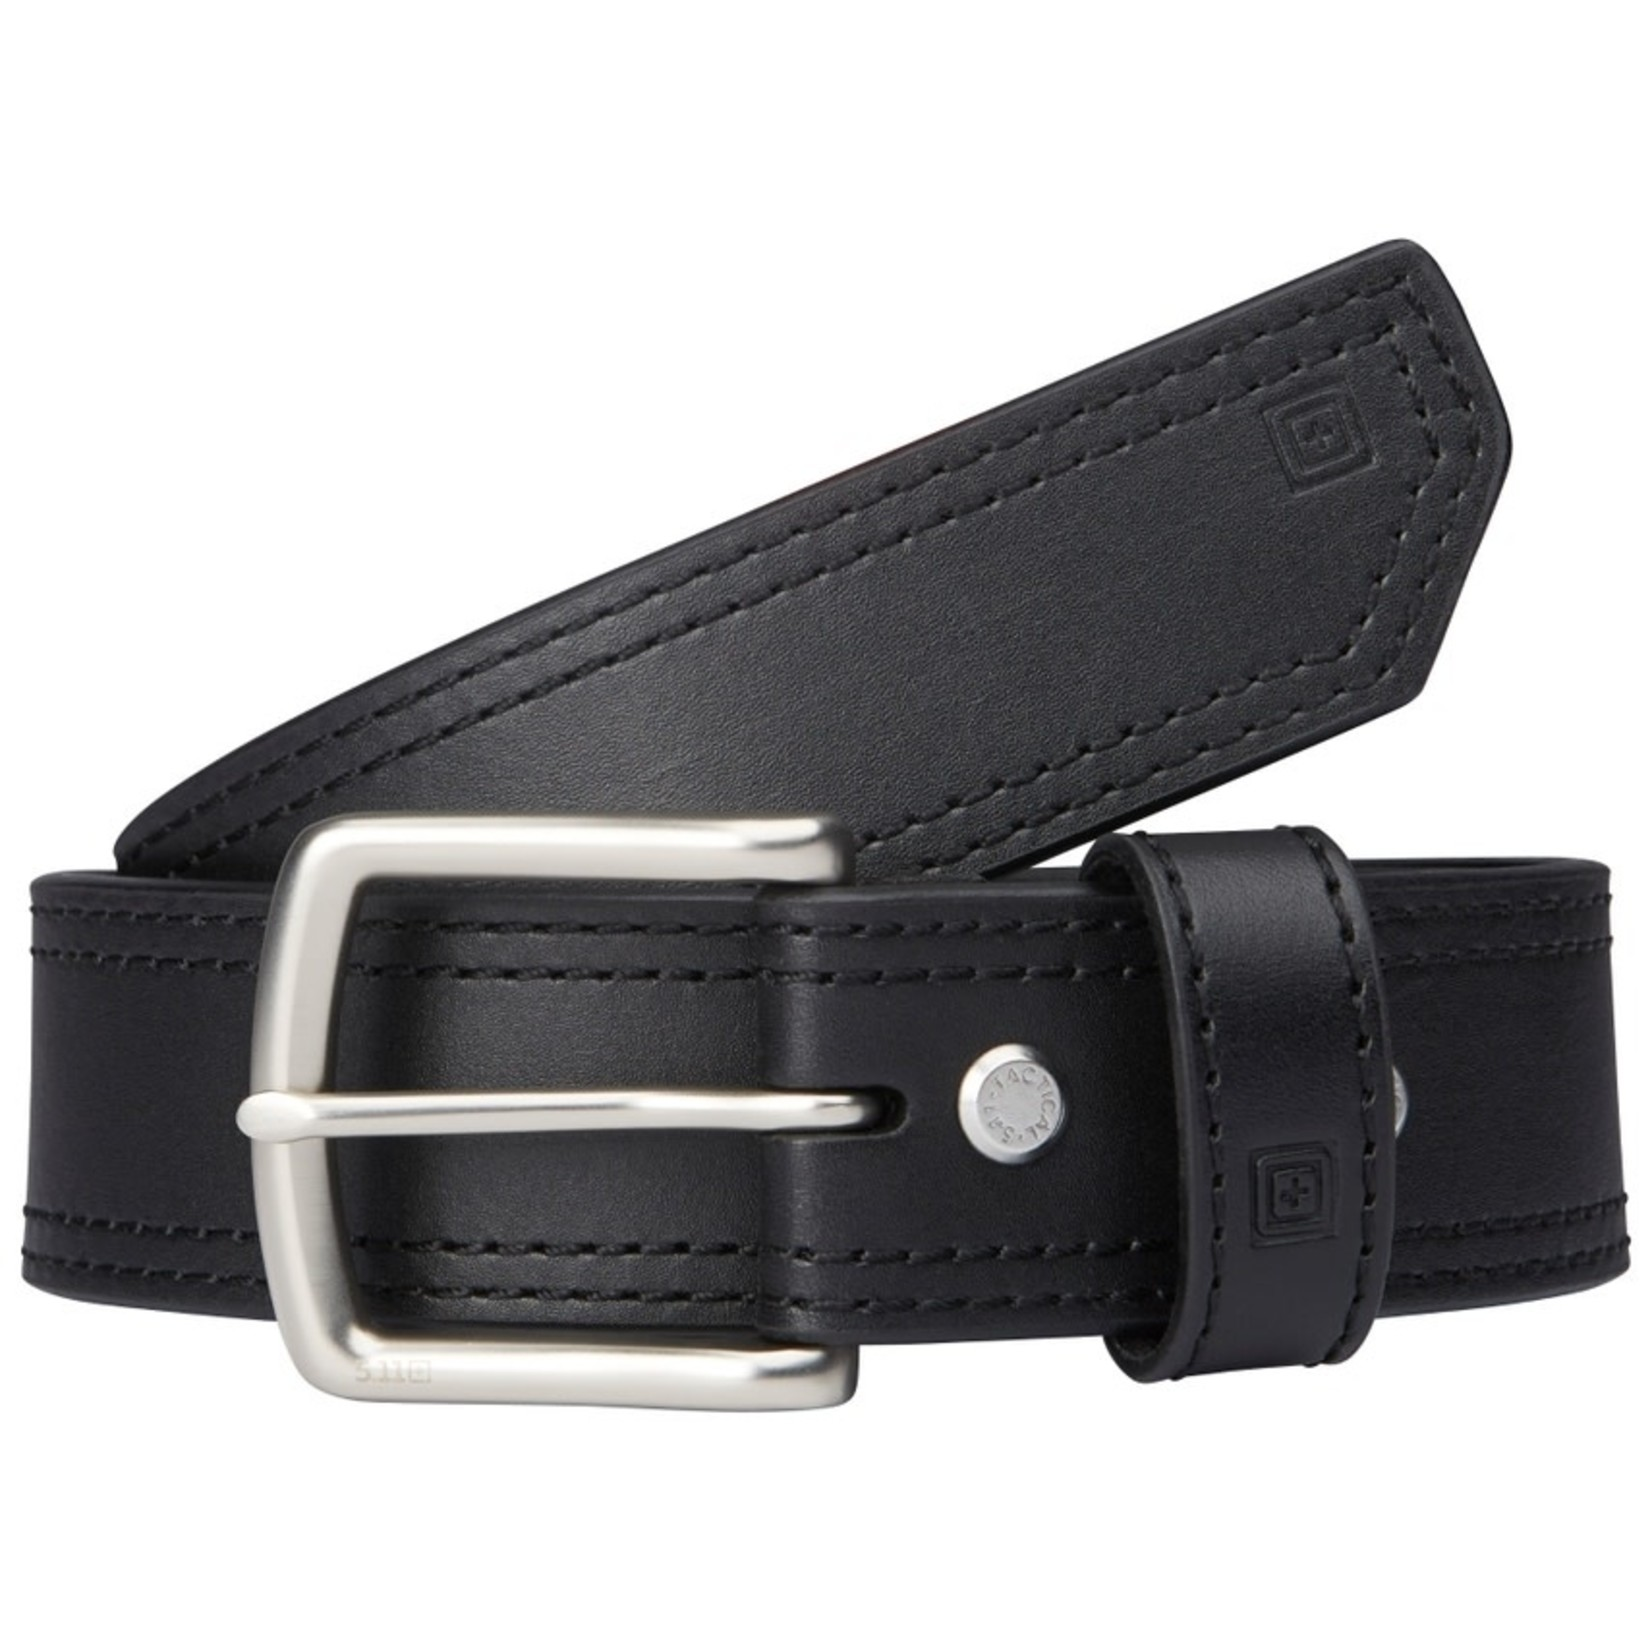 "5.11 Tactical 5.11 Arc Leather Belt 1.5"""